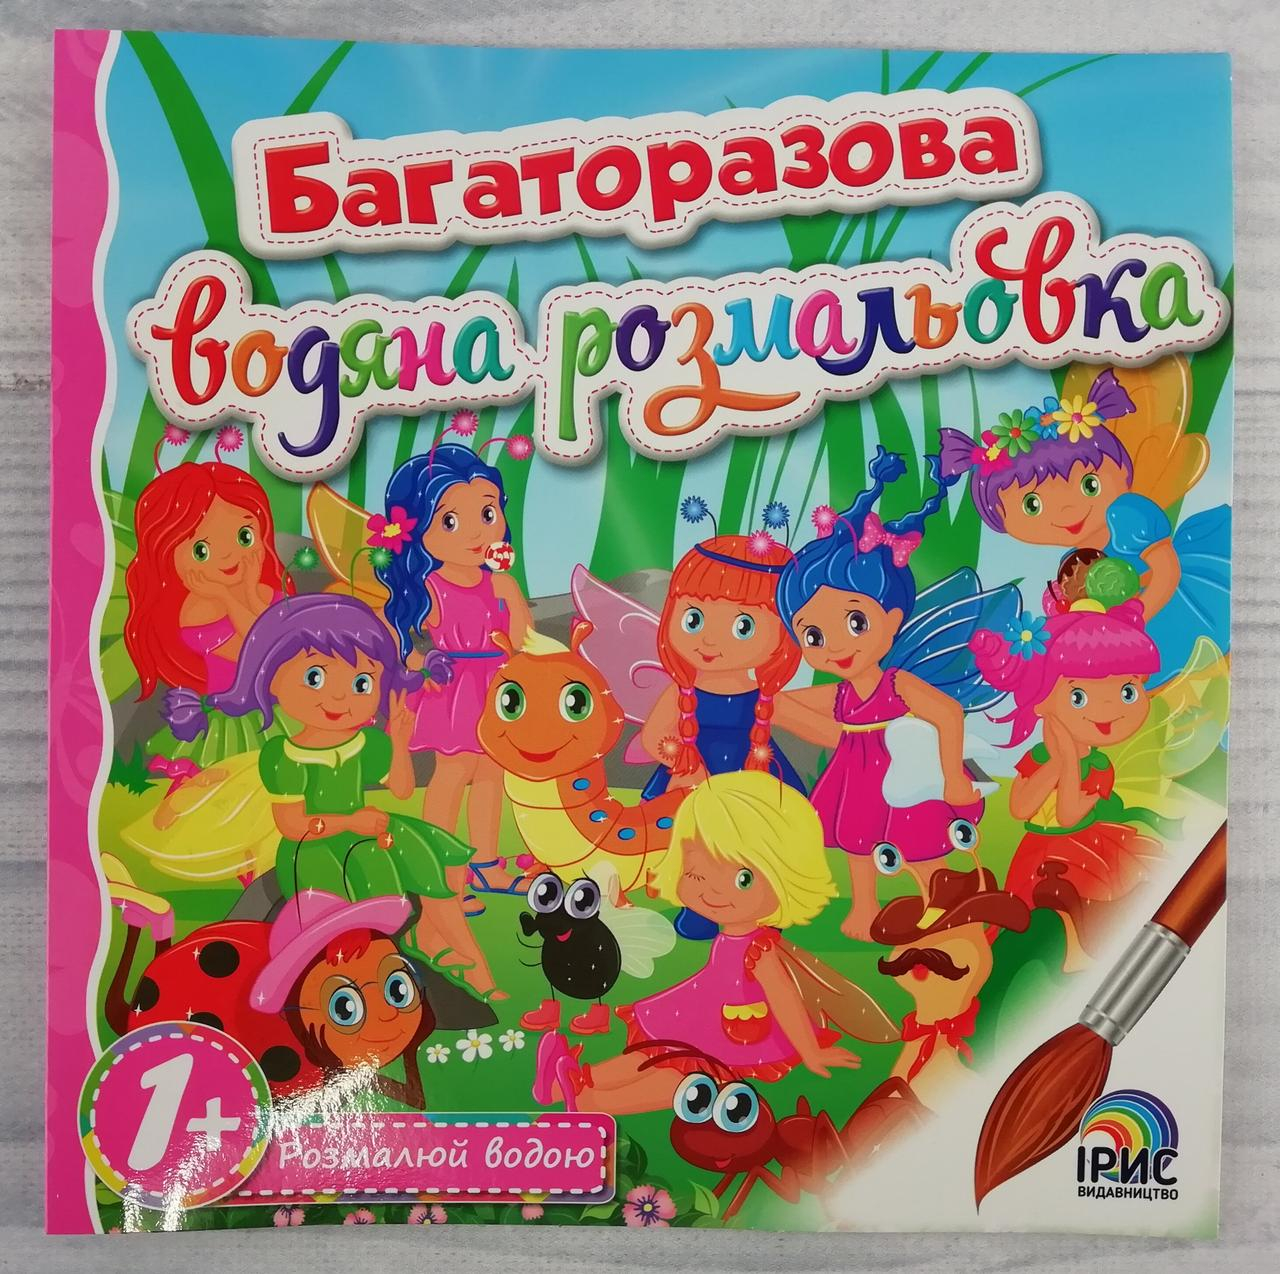 многоразовая водная раскраска книга 8 103493 ирис украина продажа цена в запорожье раскраски от интернет магазин русалочка 935358606